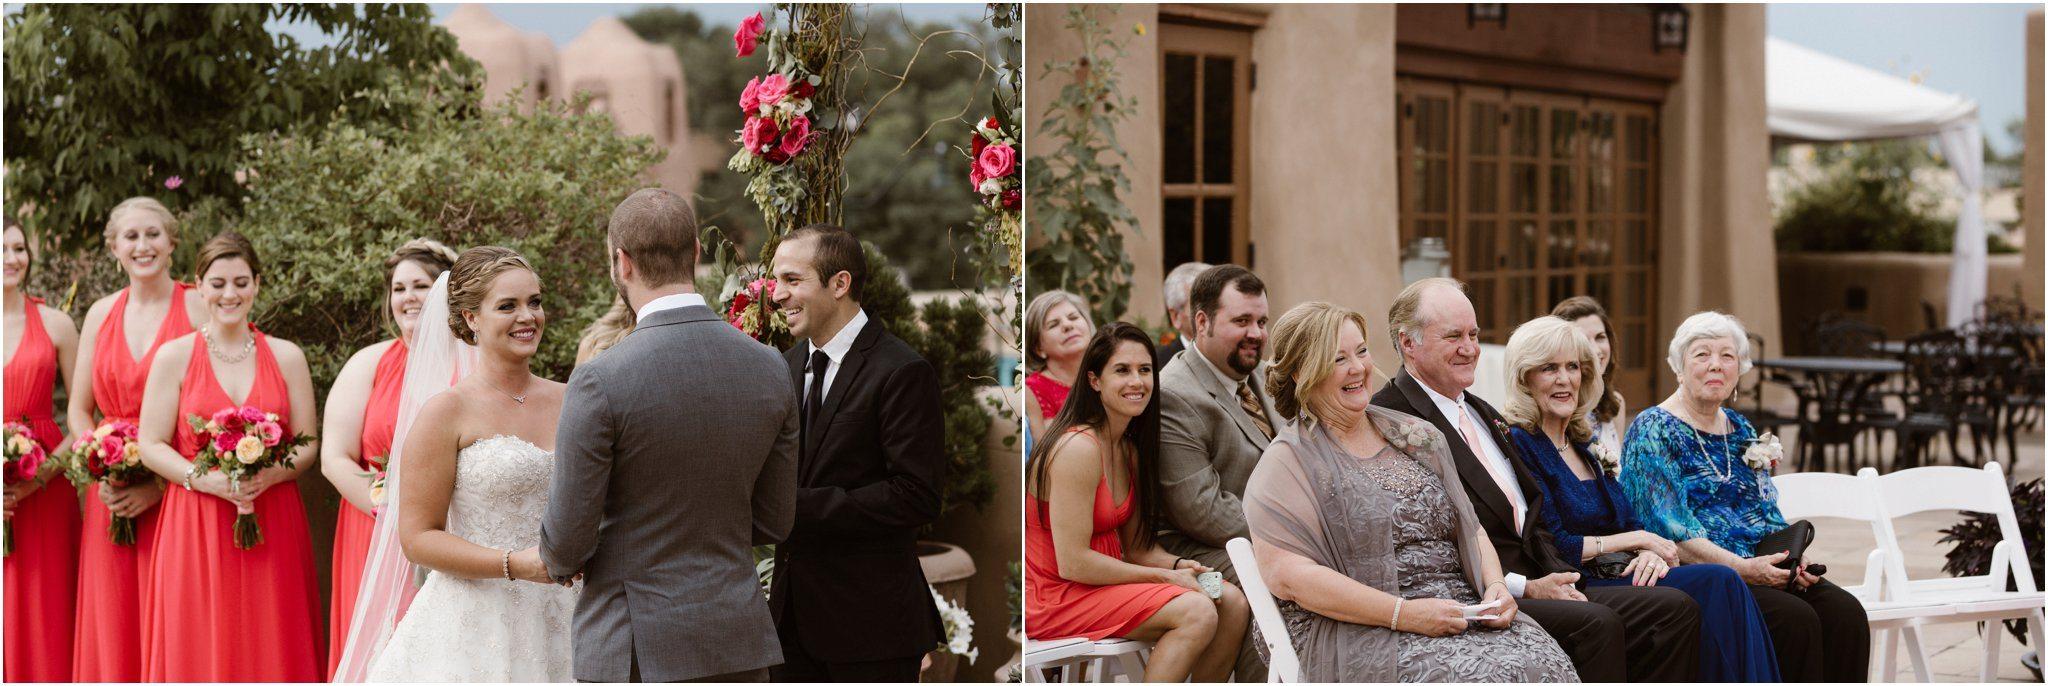 0041albuquerque-wedding-photographer_-santa-fe-wedding-photographer_-southwest-wedding-photography_-blue-rose-studio